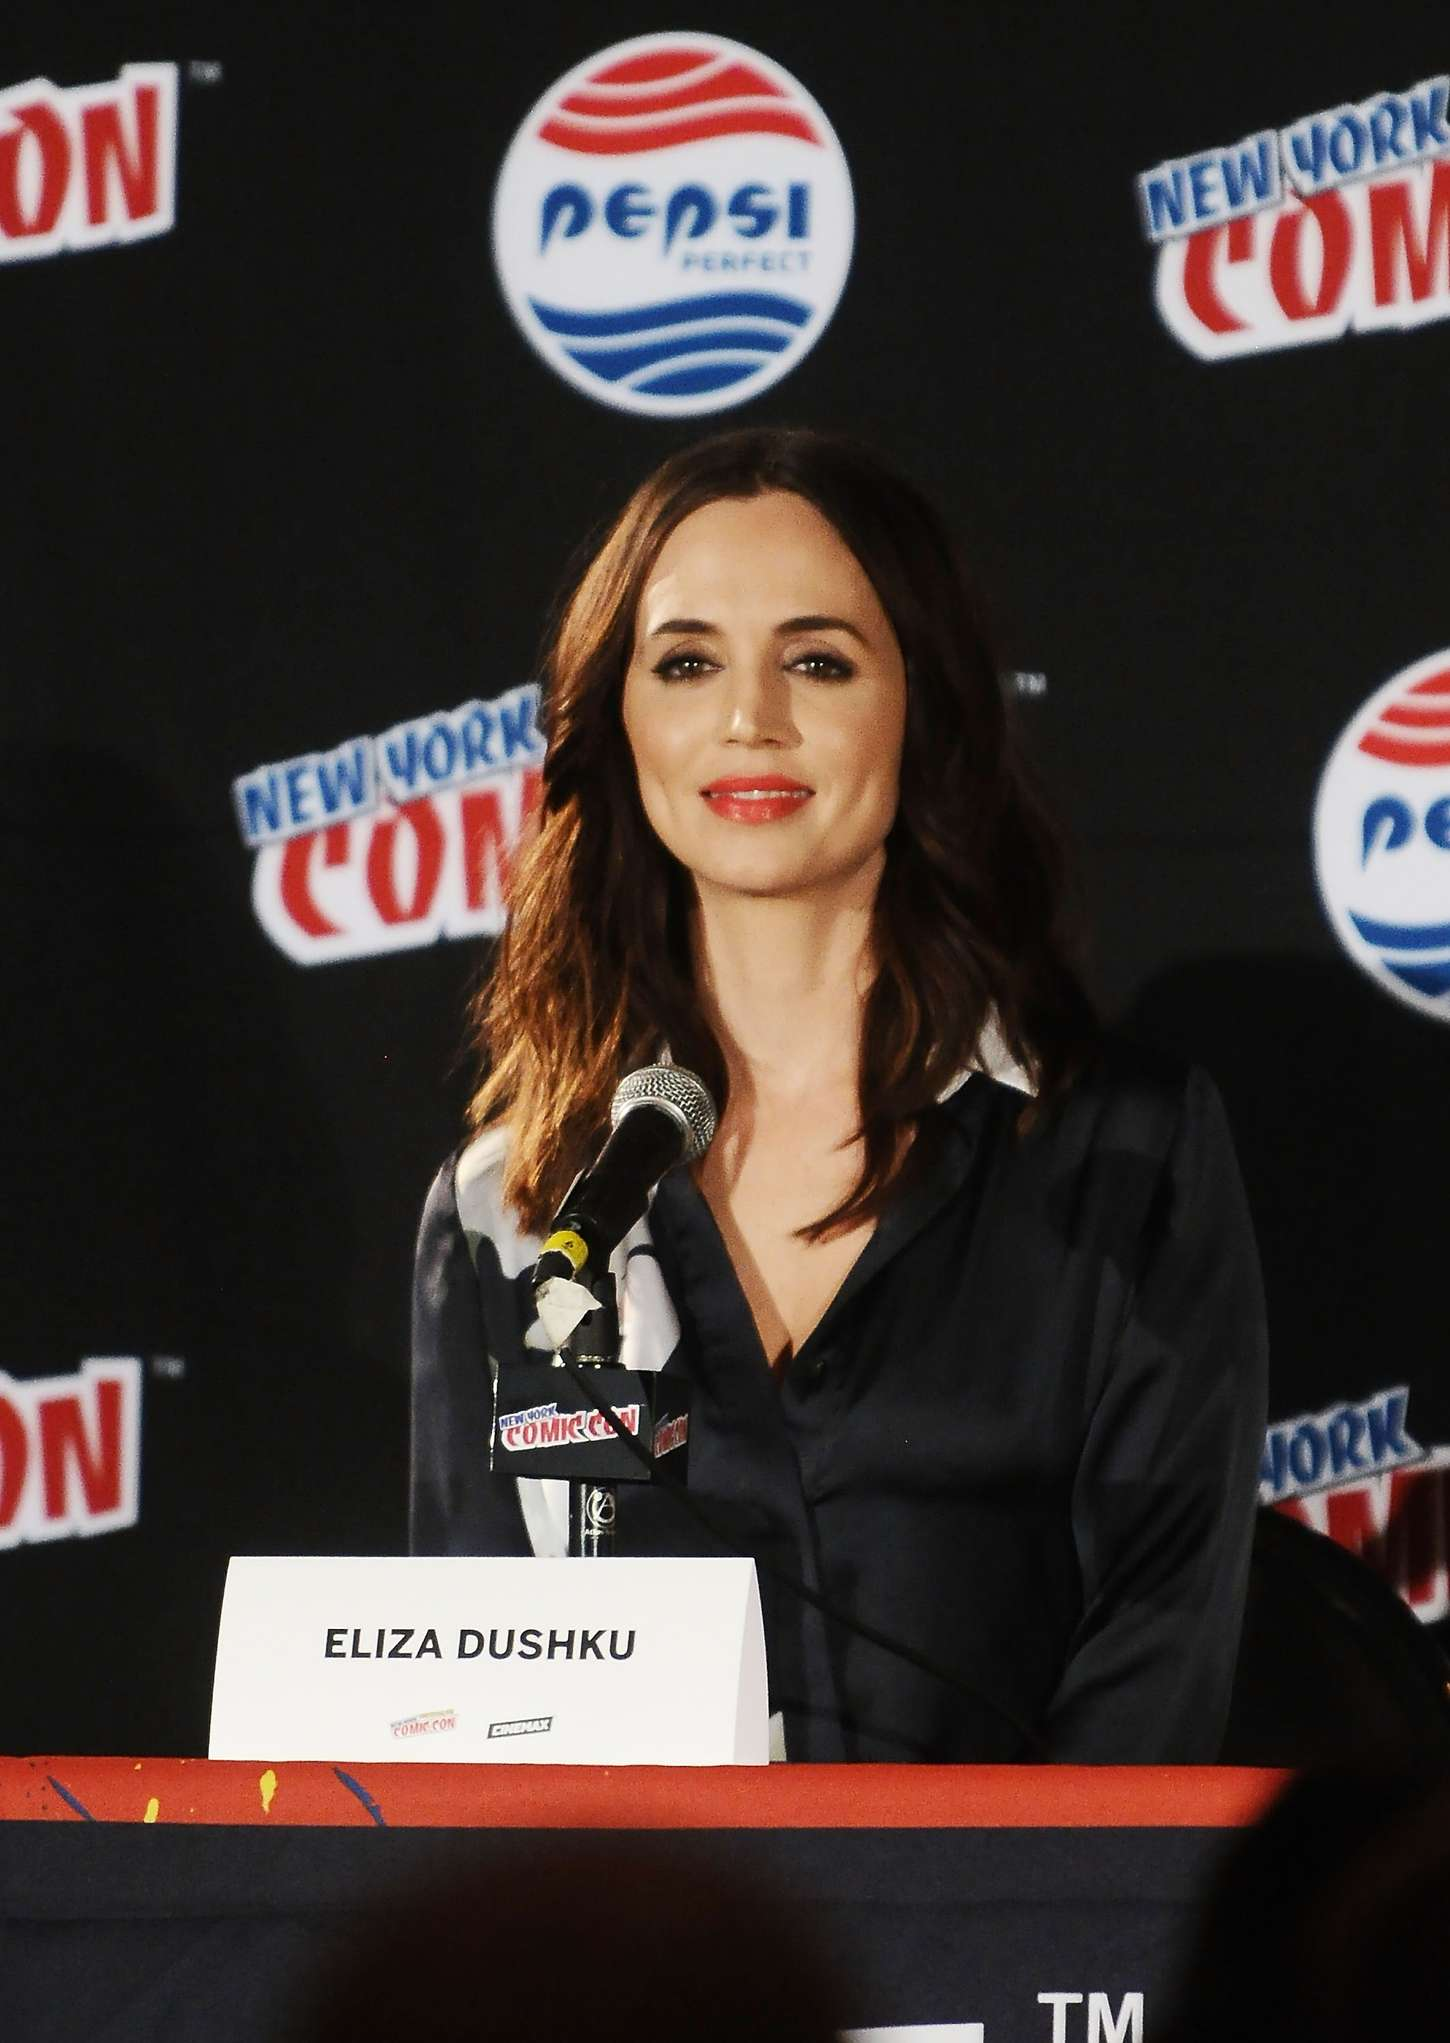 Eliza Dushku - 2015 New York Comic-Con Banshee Panel in NY